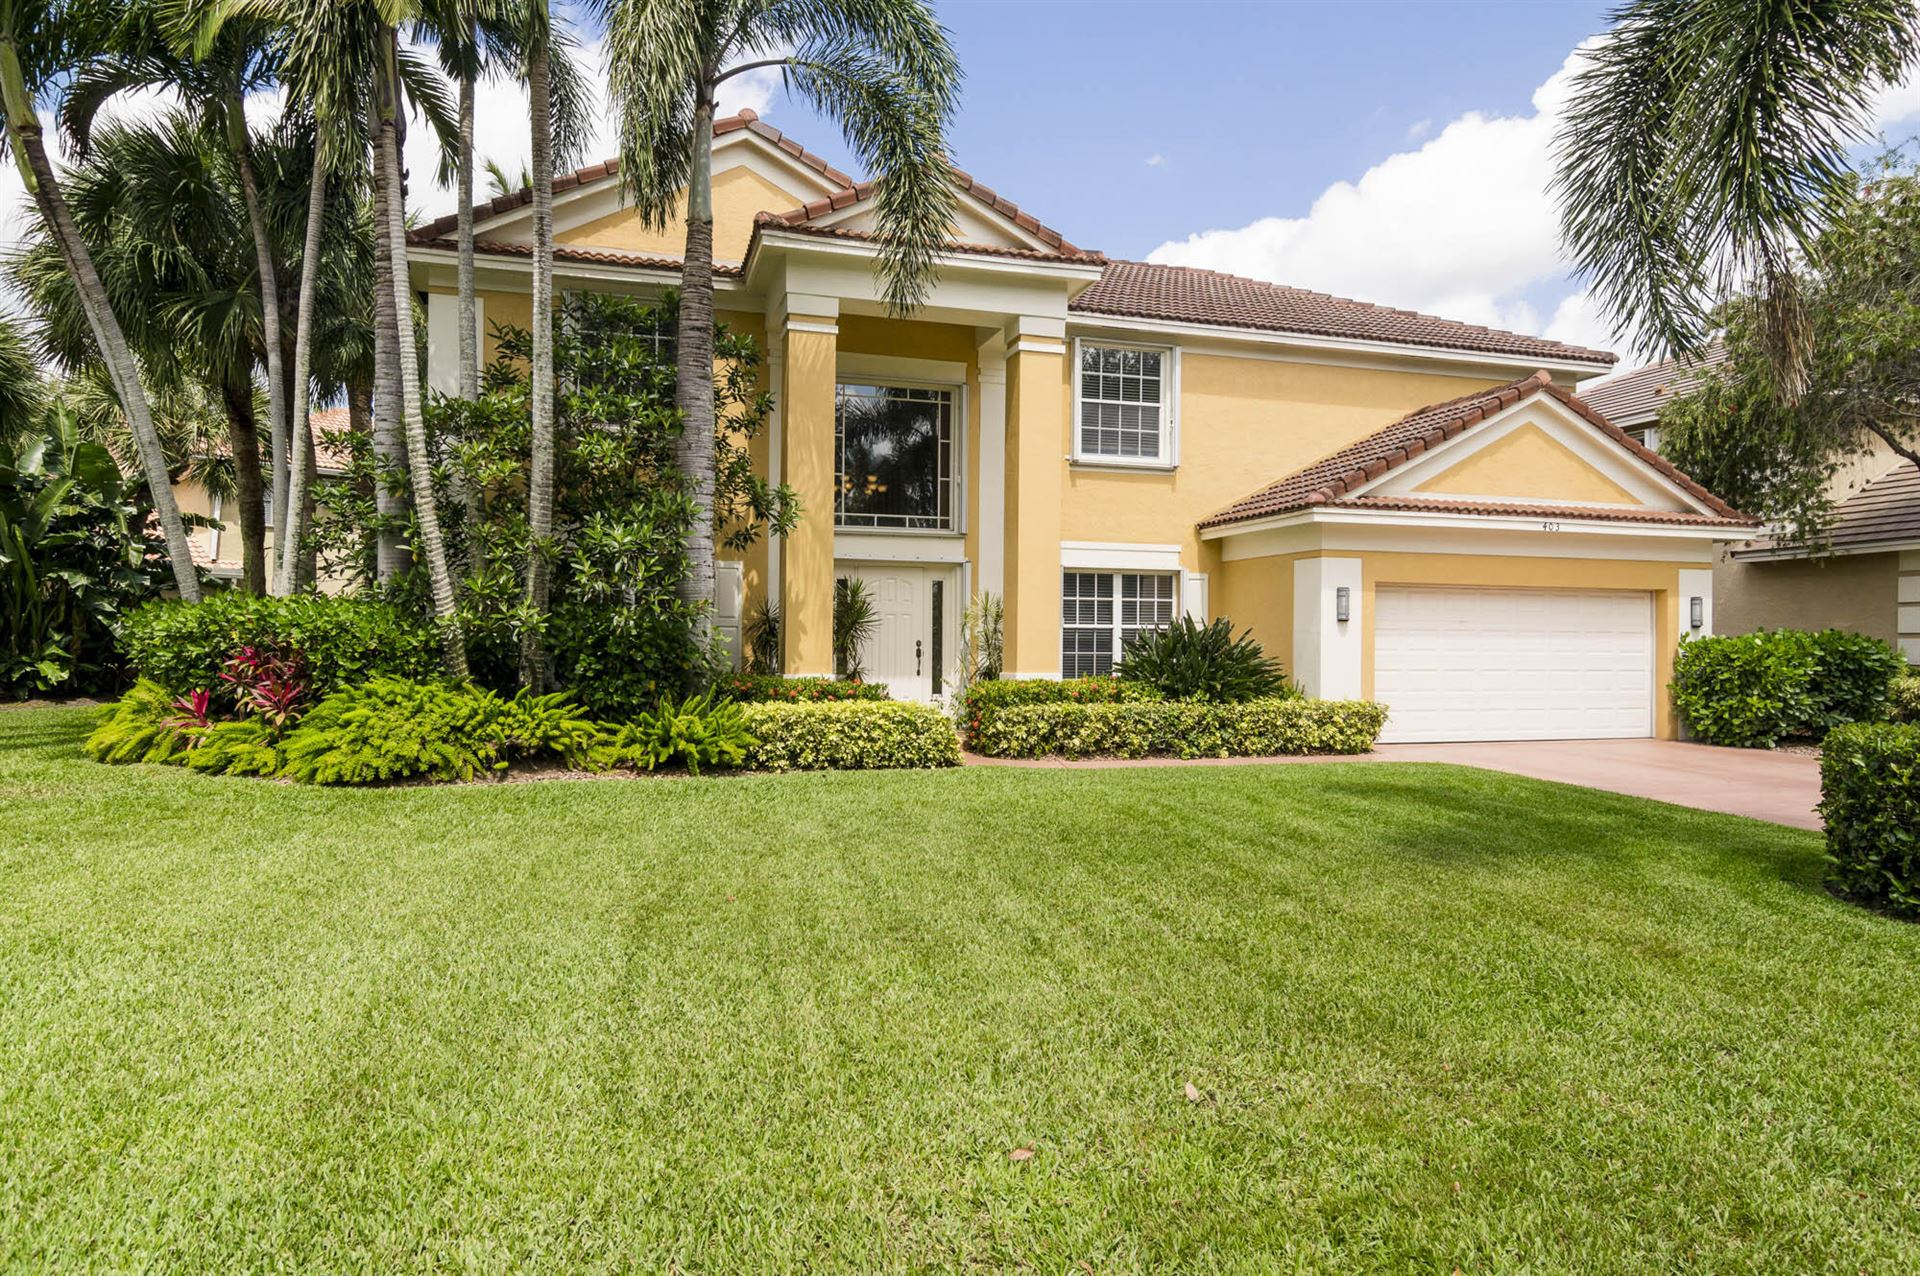 403 Meadowlark Lane, Jupiter, FL 33458 - MLS#: RX-10715123